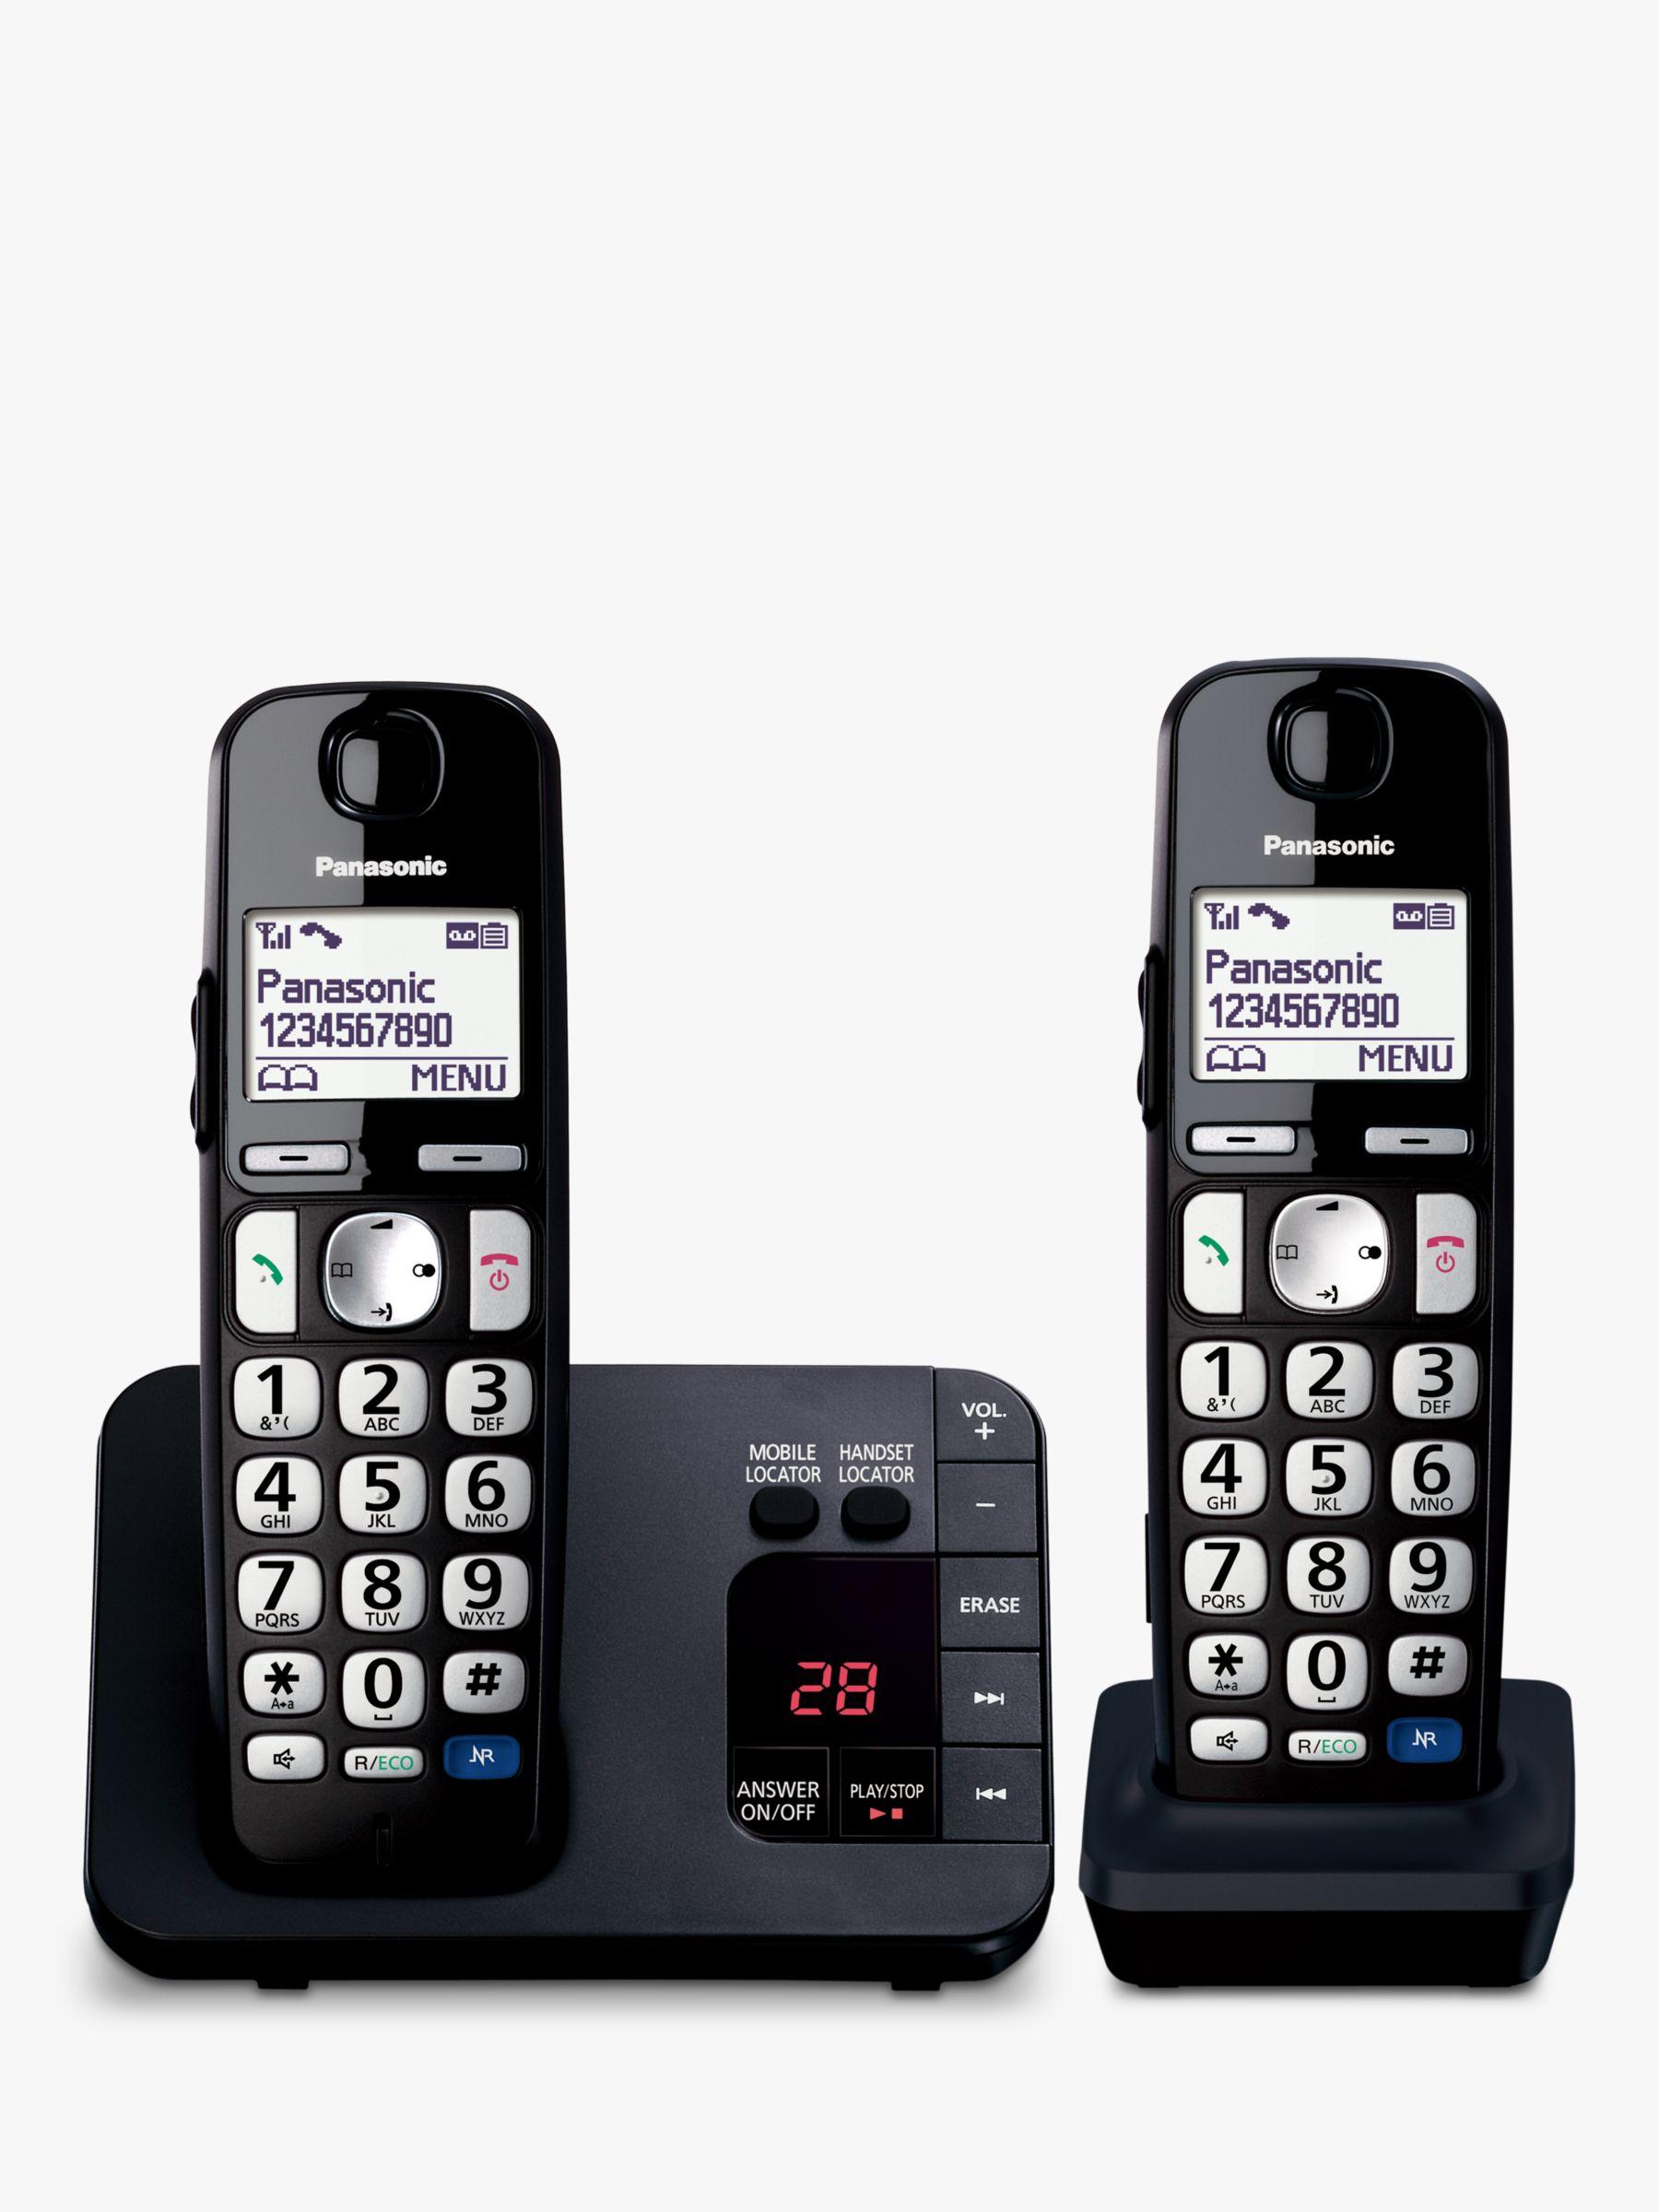 Panasonic Panasonic KX-TGE722EB Bigger Button Digital Cordless Telephone with 1.8 LCD Screen, Hearing Aid Compatibility, Nuisance Call Block & Answering Machine, Twin Dect, Black